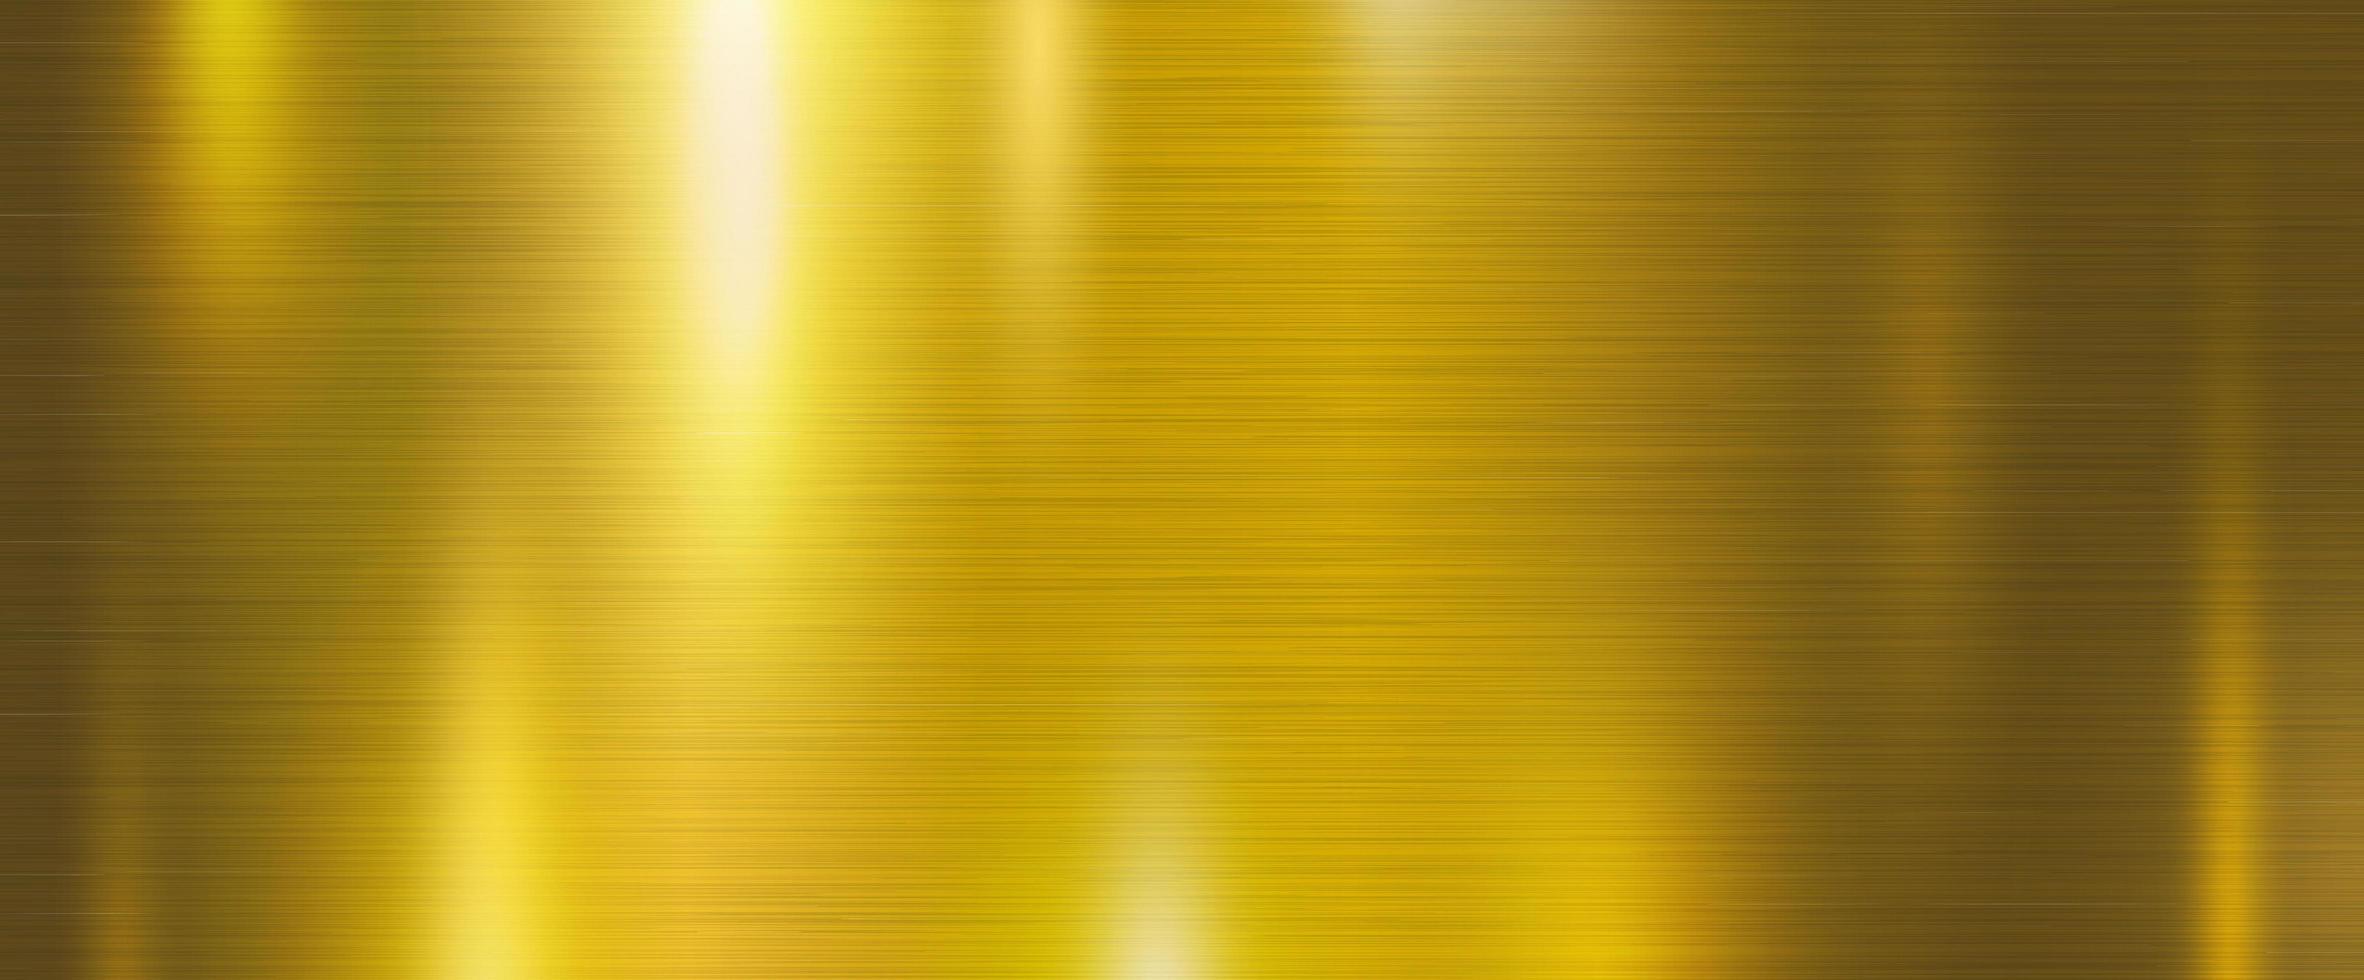 Gold metal background vector